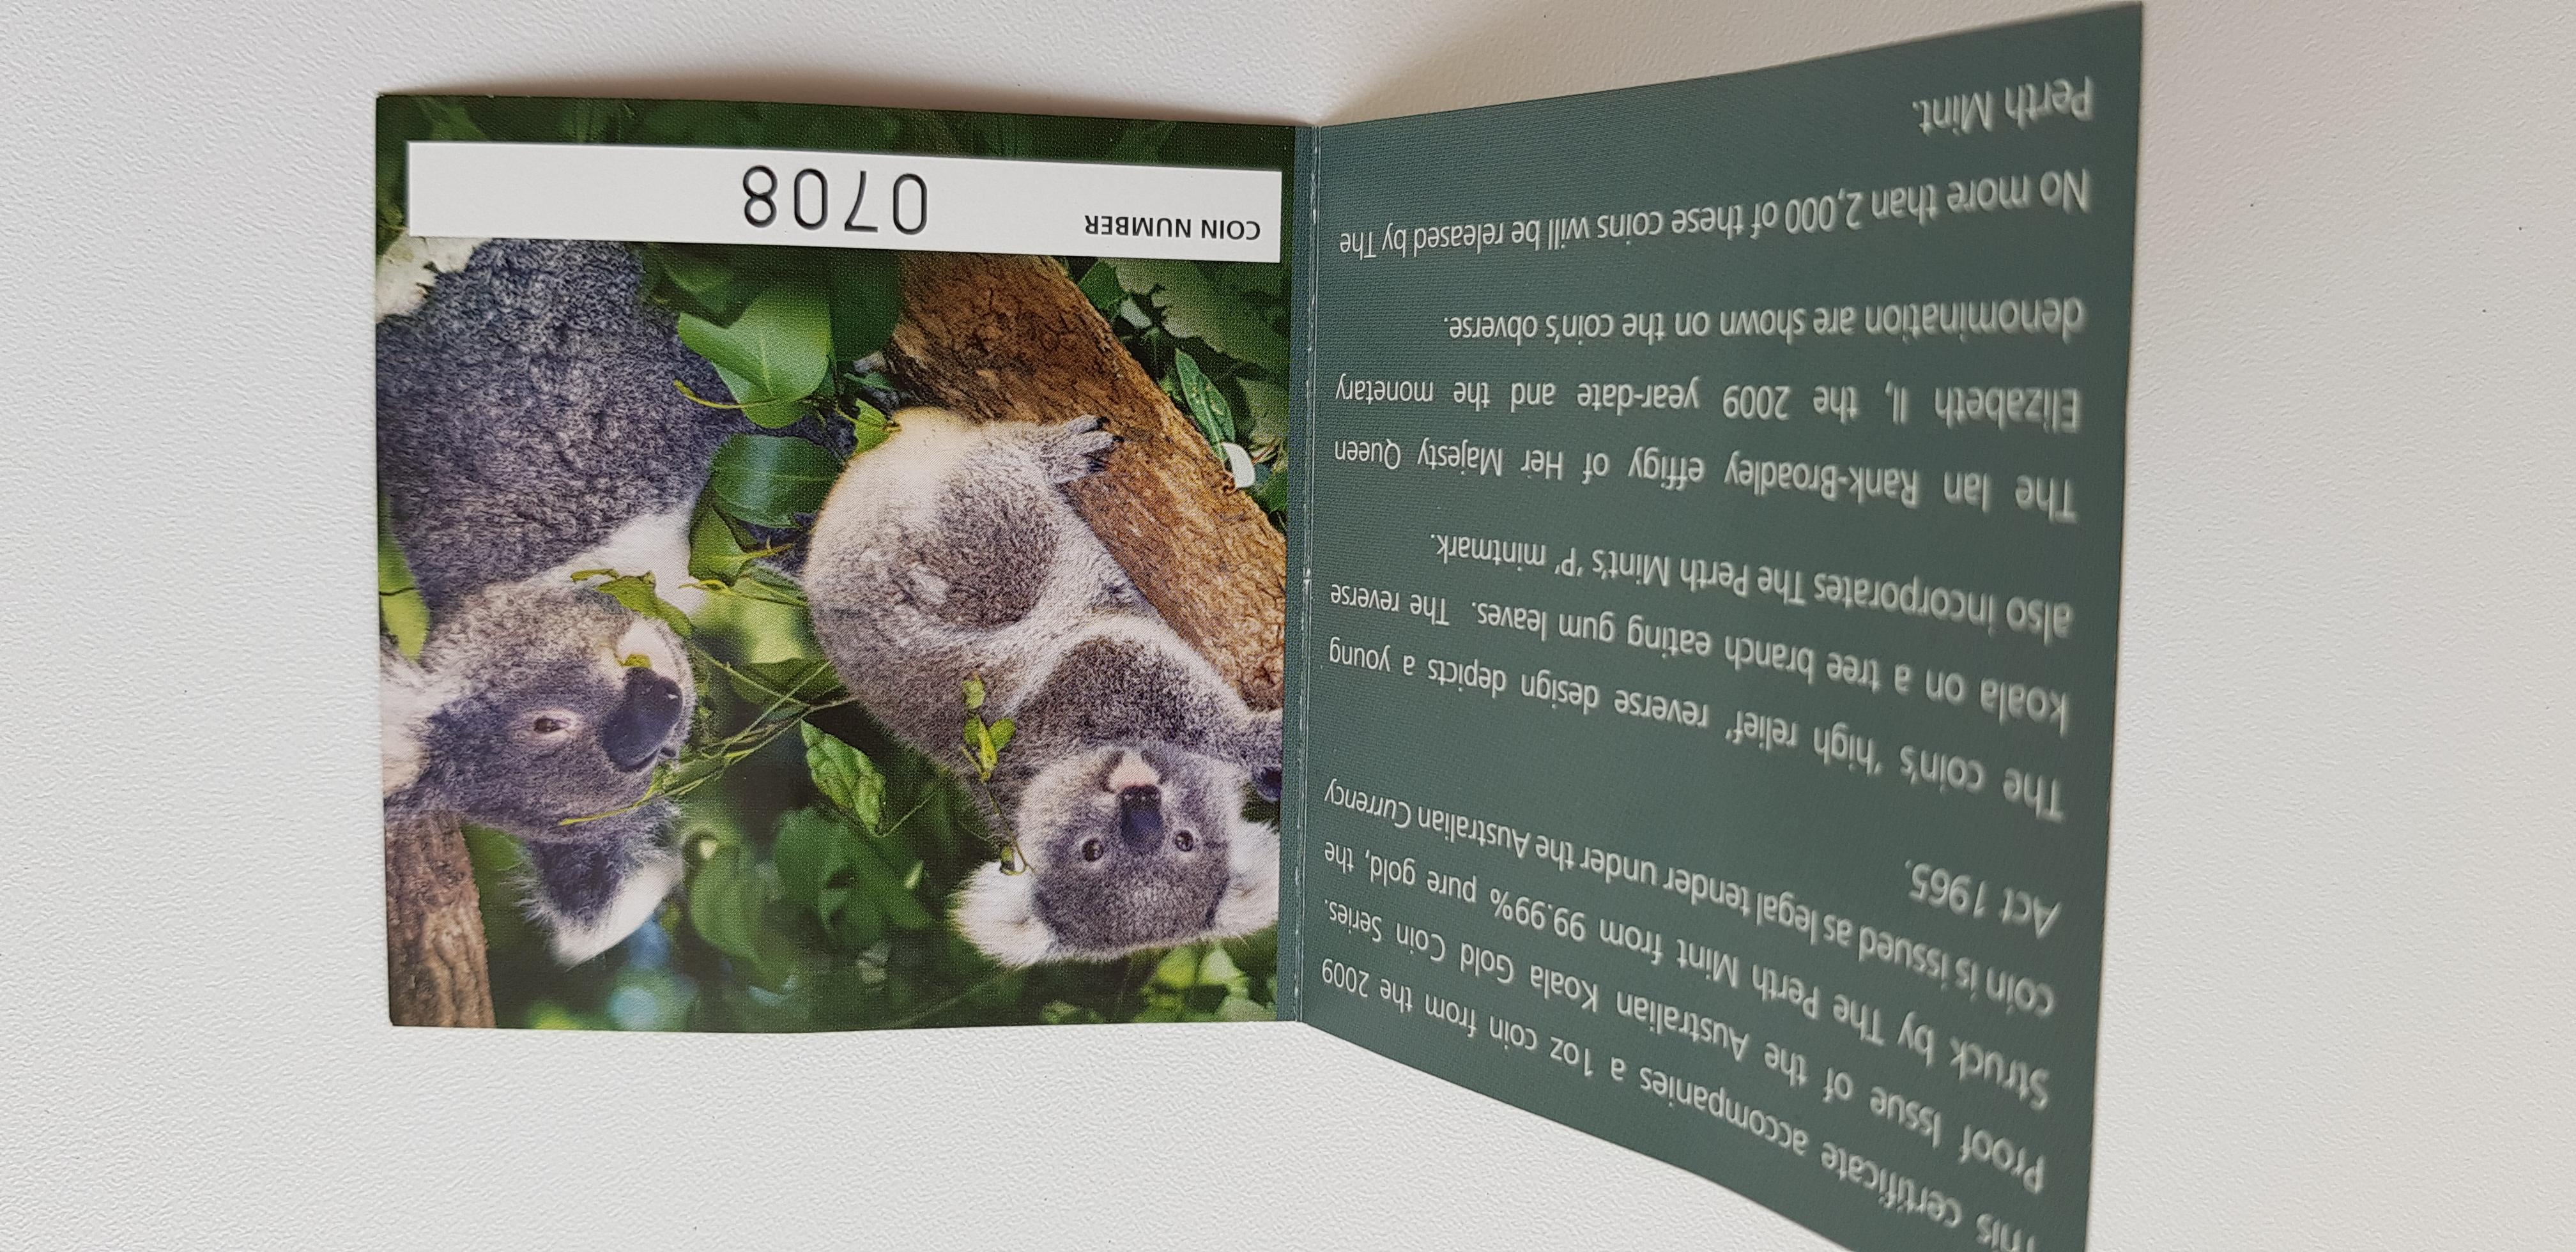 1 Unze (oz) Koala Goldmünze Proof High Relief Jahrgang 2009